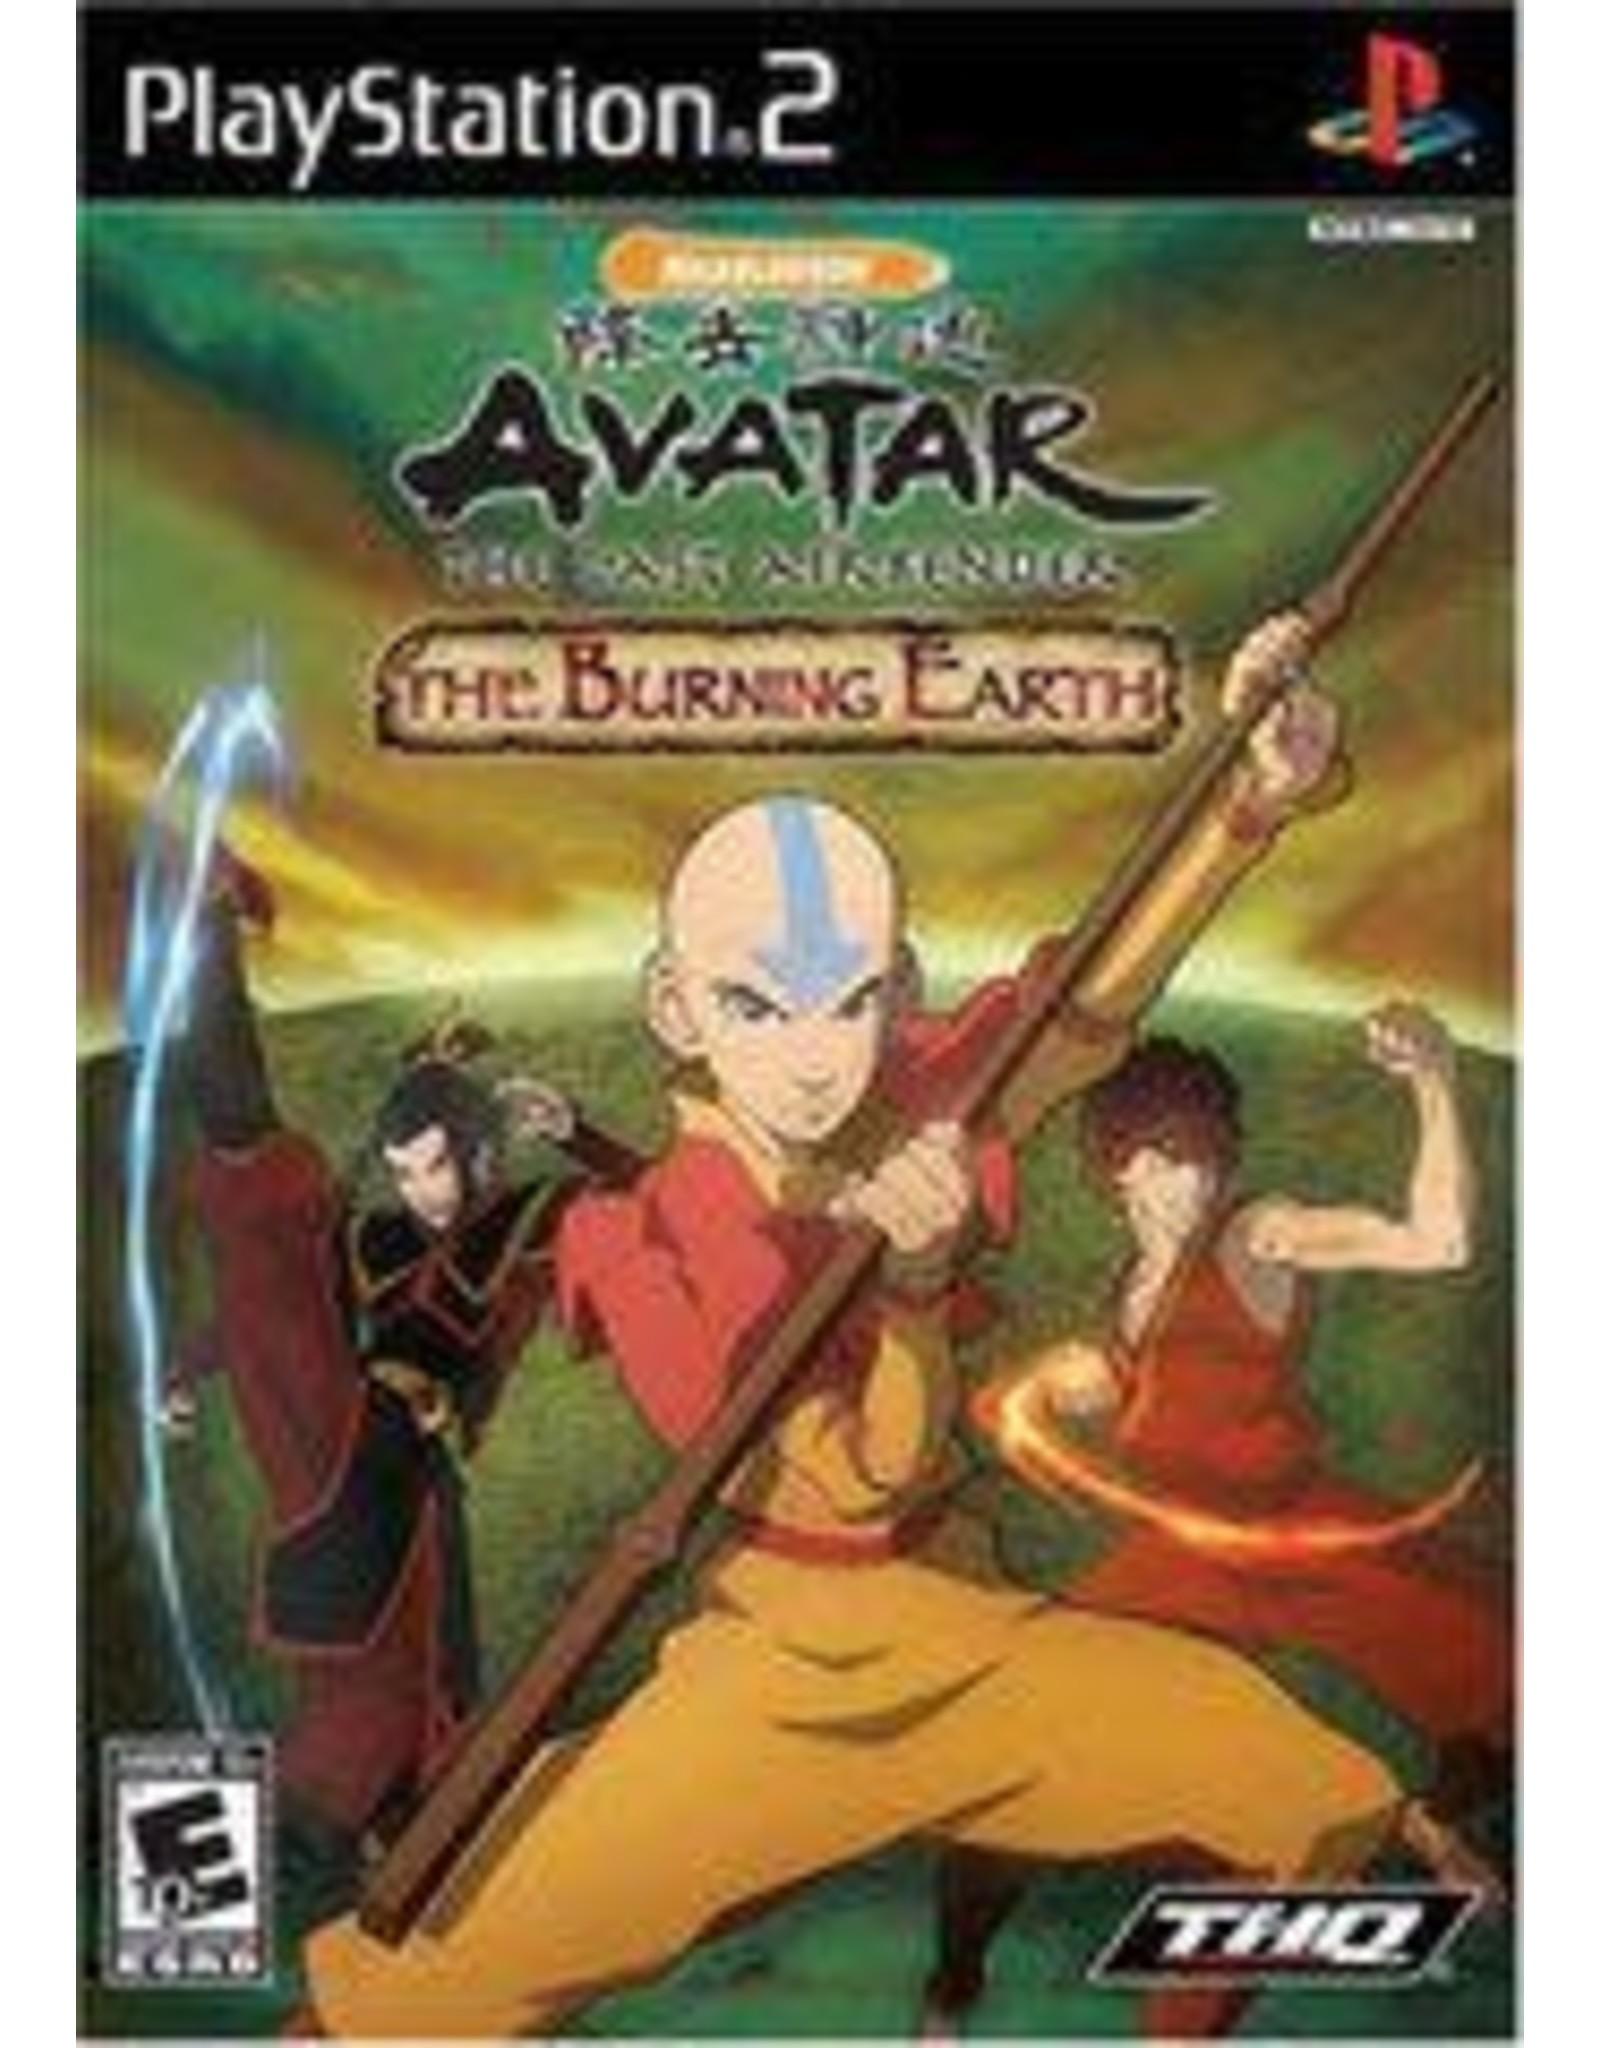 Playstation 2 Avatar The Last Airbender The Burning Earth (CiB))